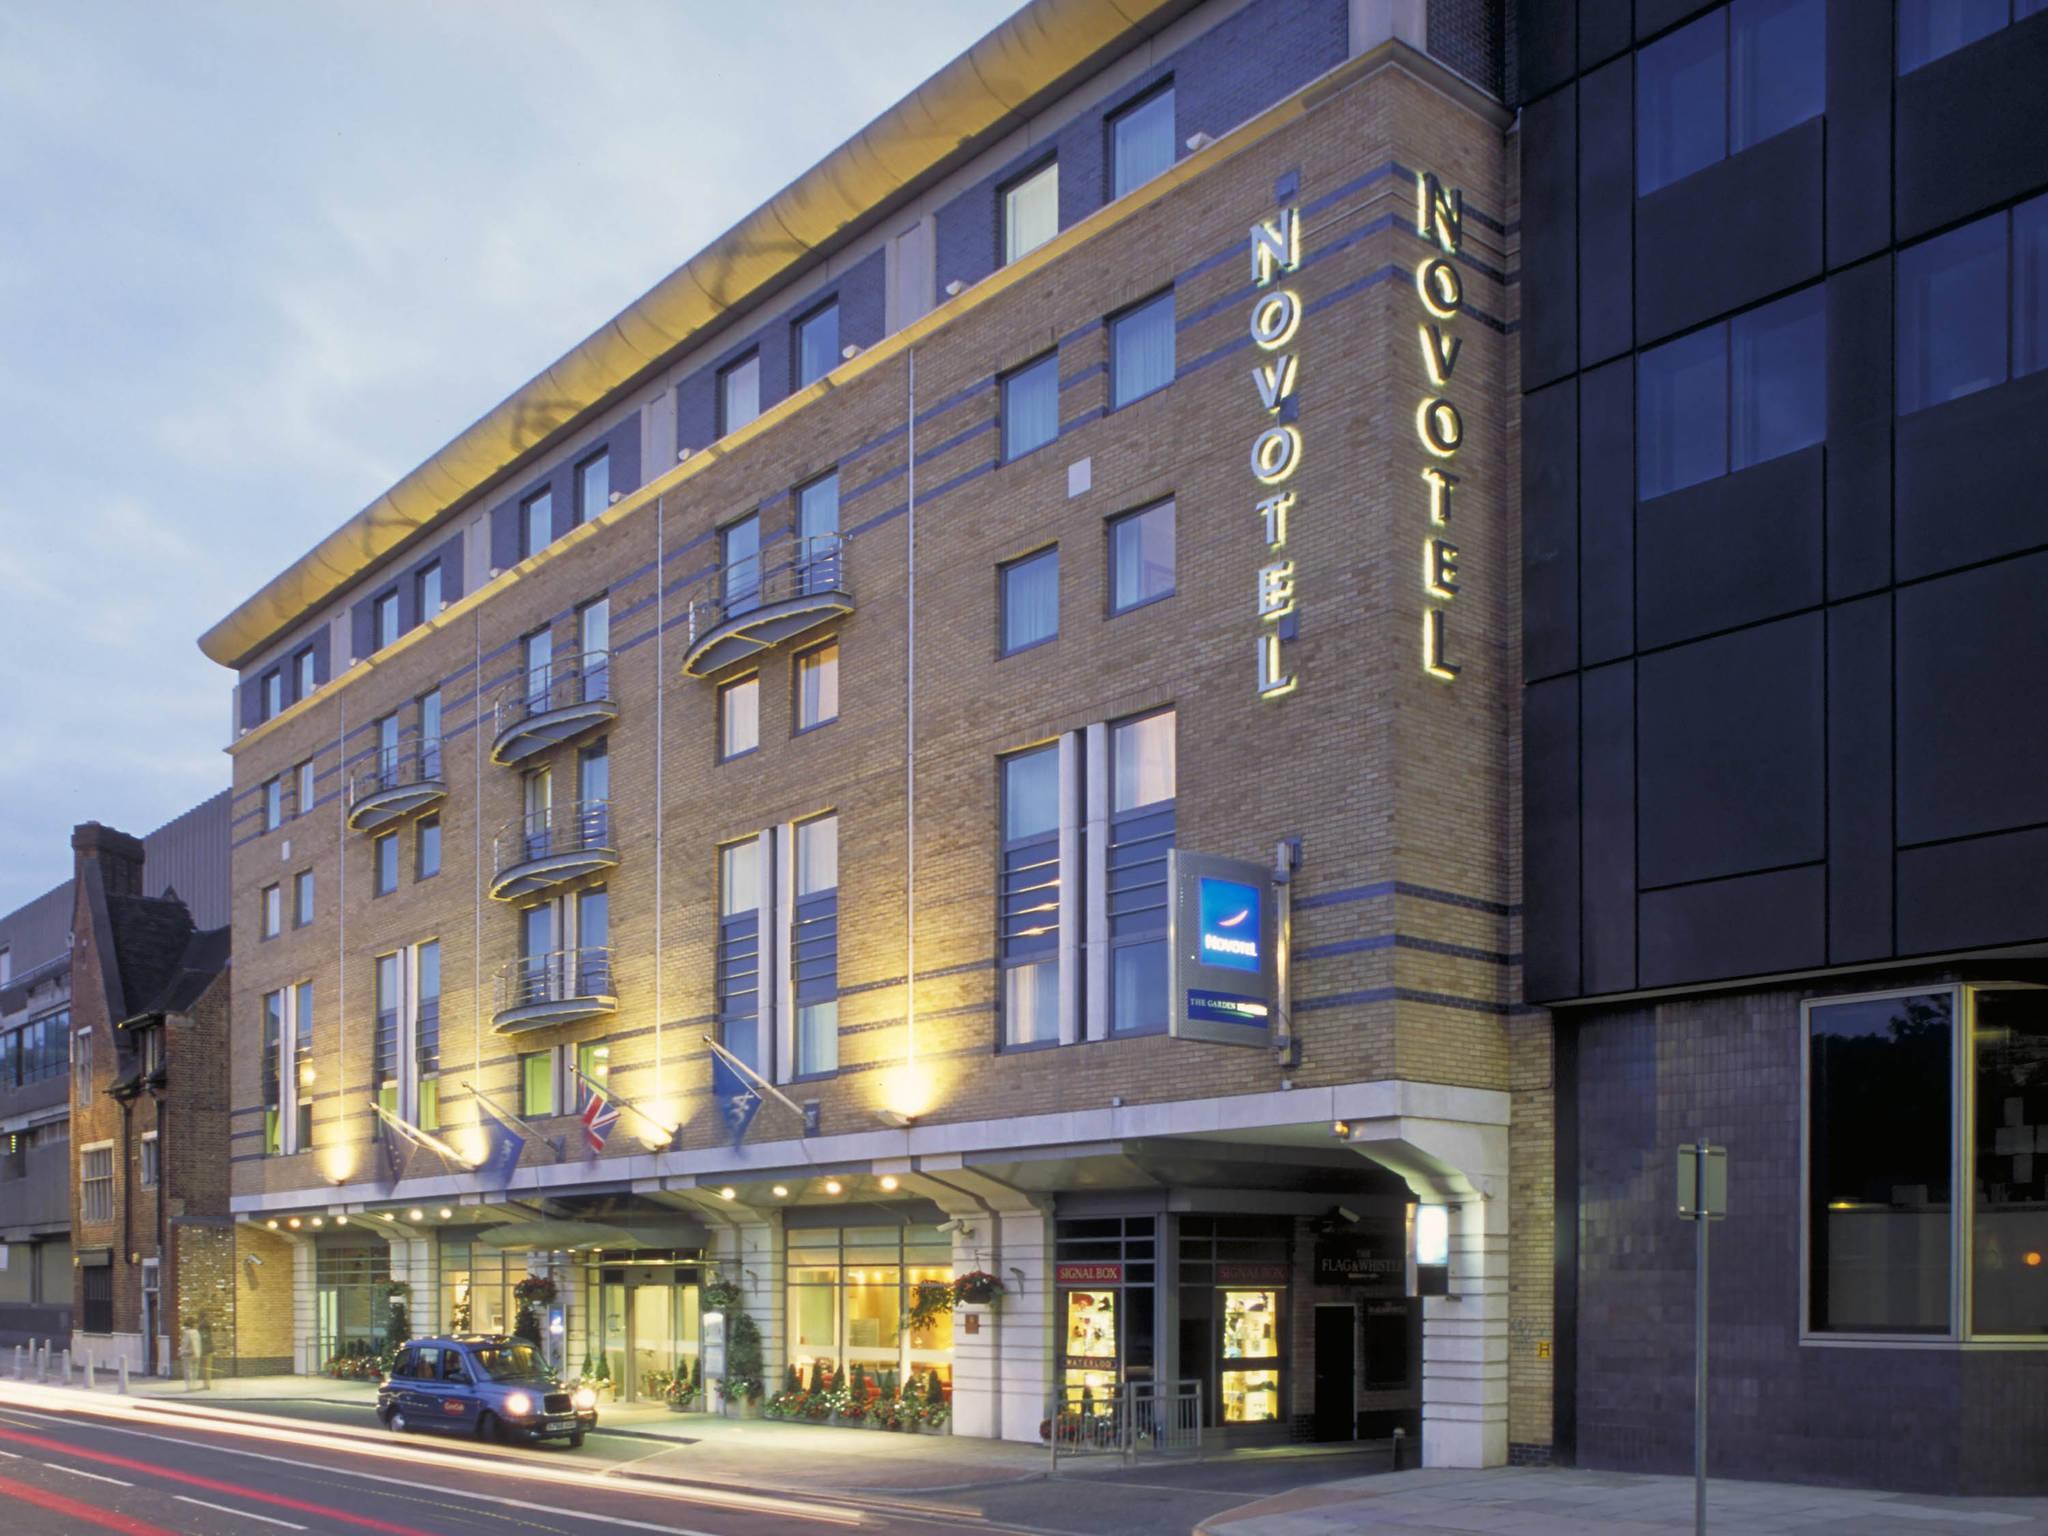 فندق - نوفوتيل Novotel لندن واترلو